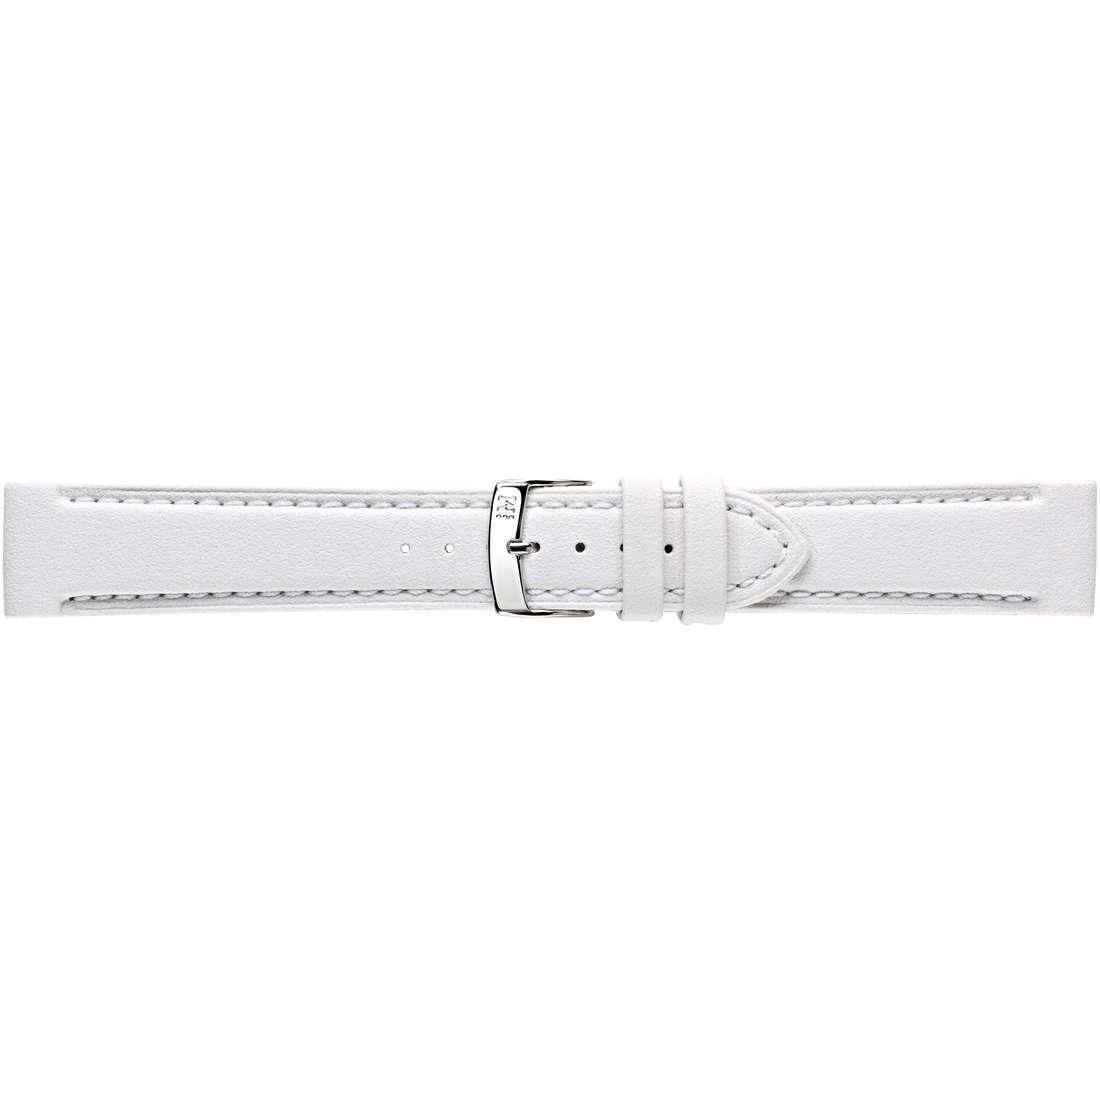 watch watch bands watch straps man Morellato Linea Sport A01U3822A42017CR18